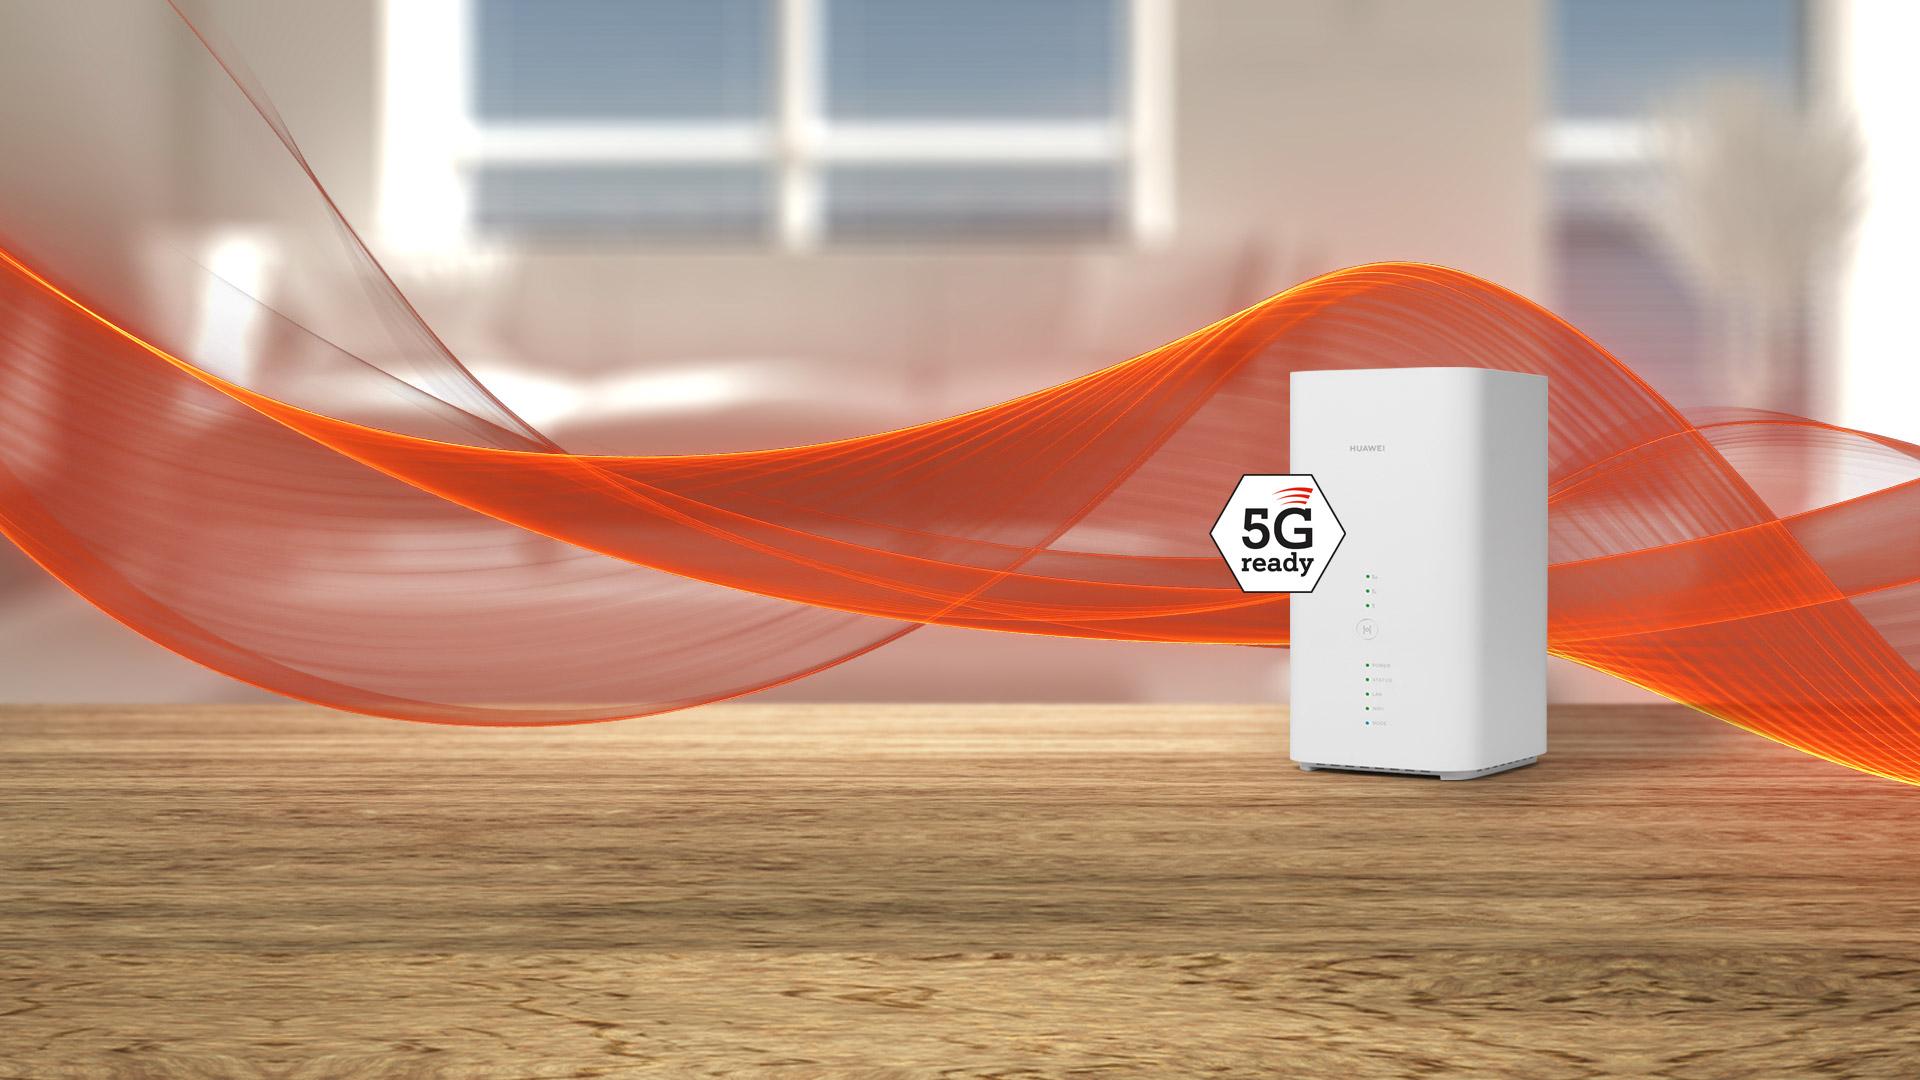 A1 Business Net Cube 5G ready